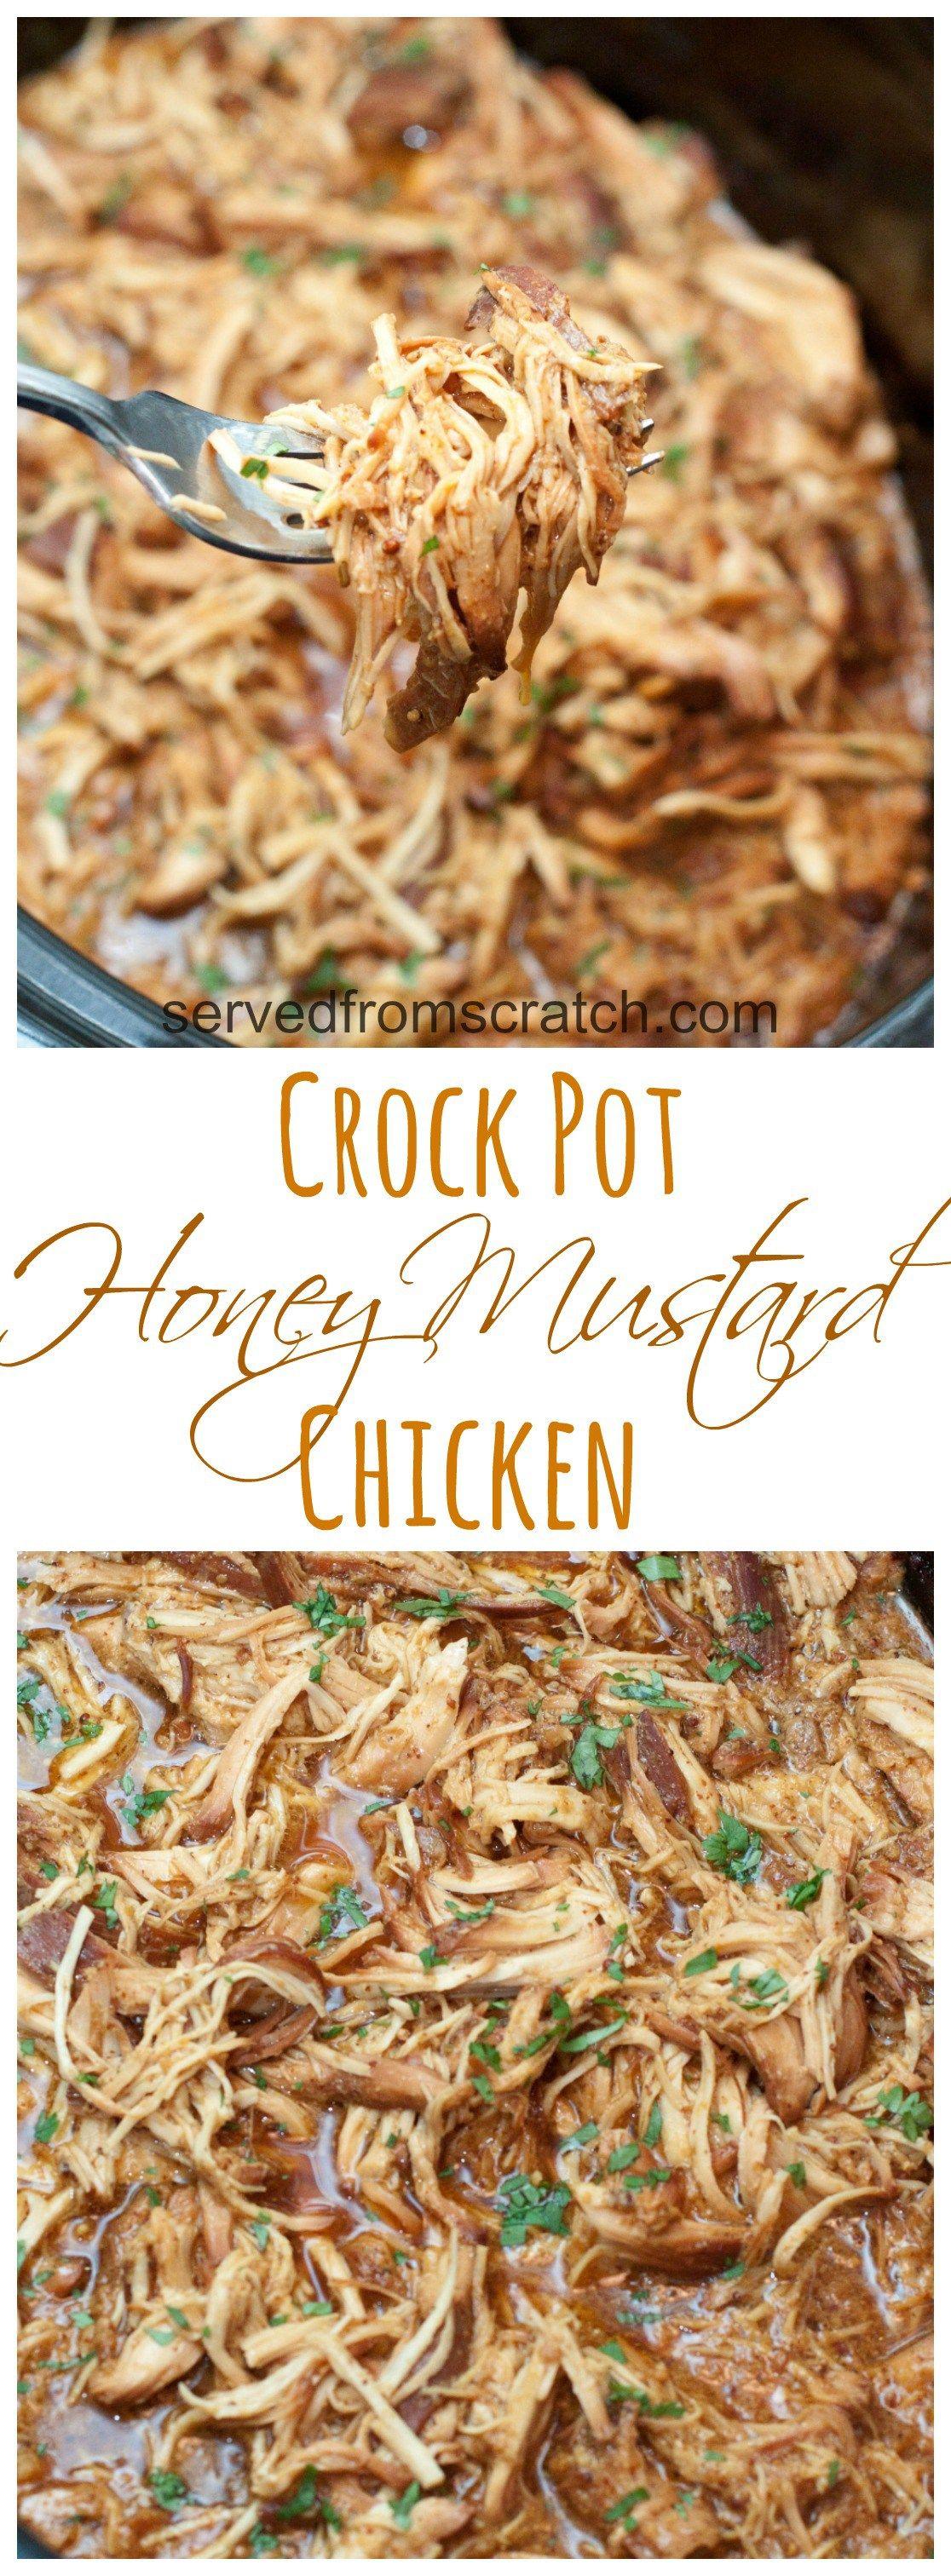 Crock Pot Honey Mustard Chicken - Served From Scratch